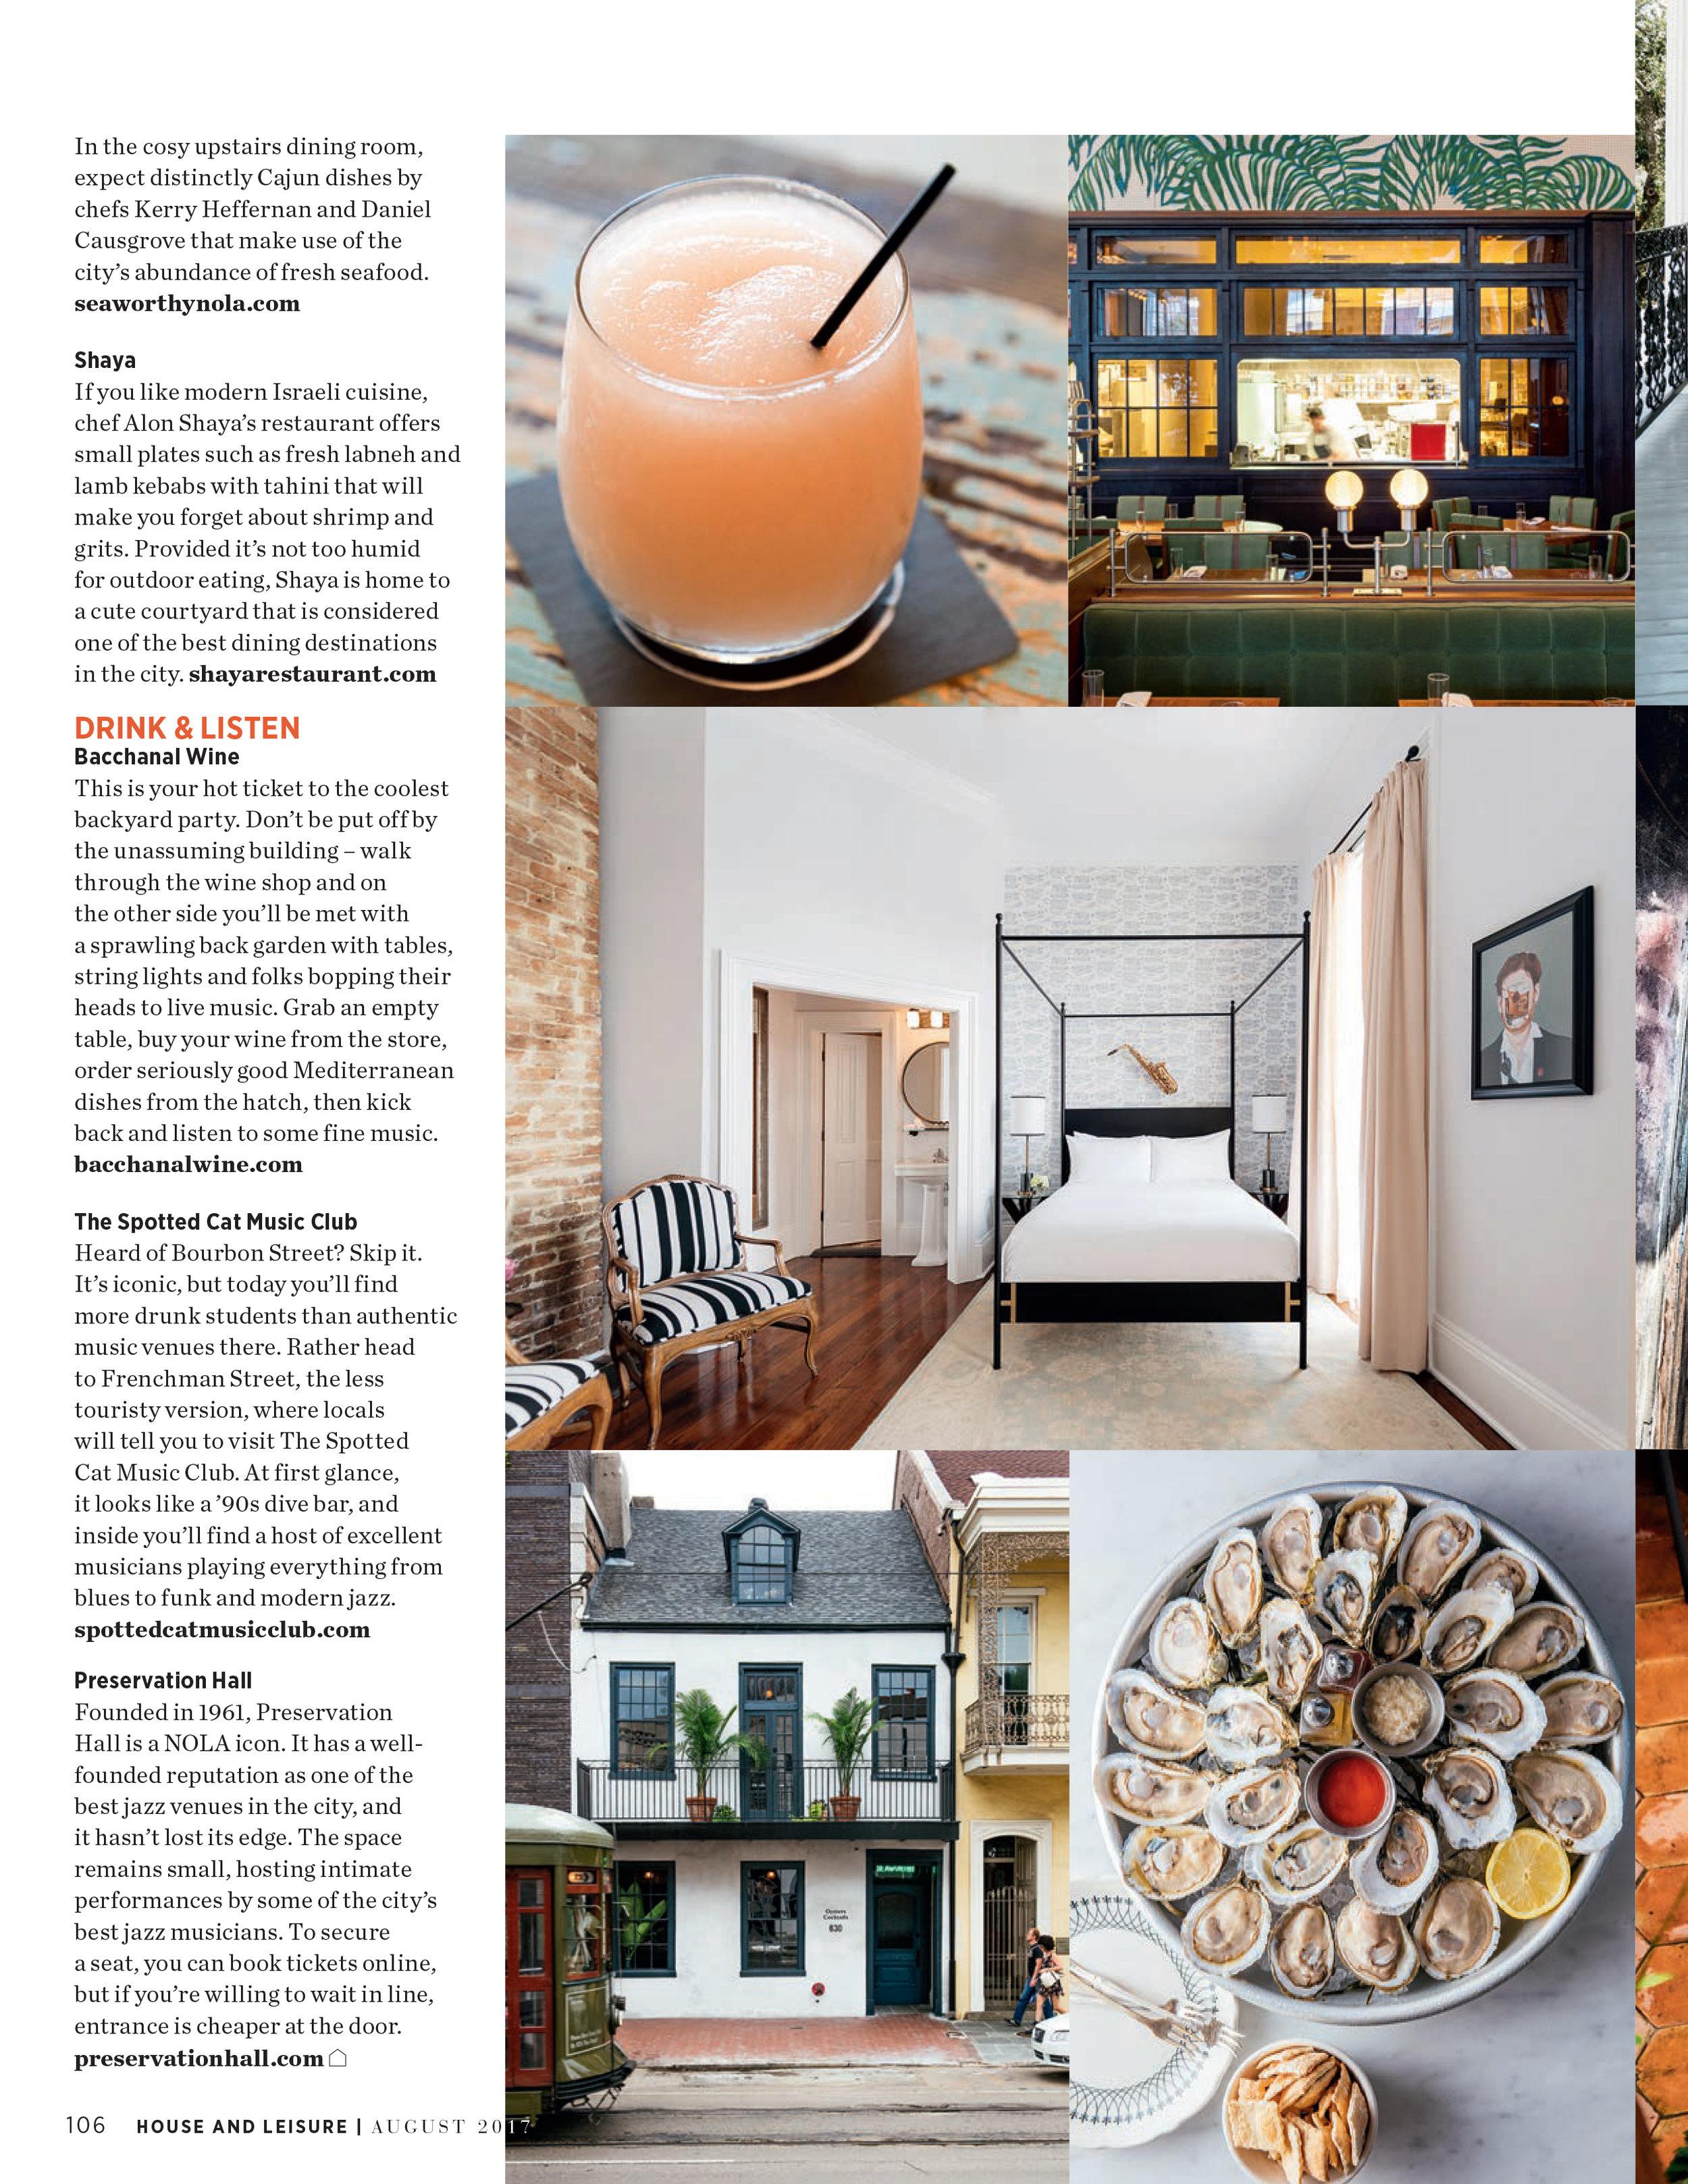 House & Leisure Magazine, August 2017-3.jpg